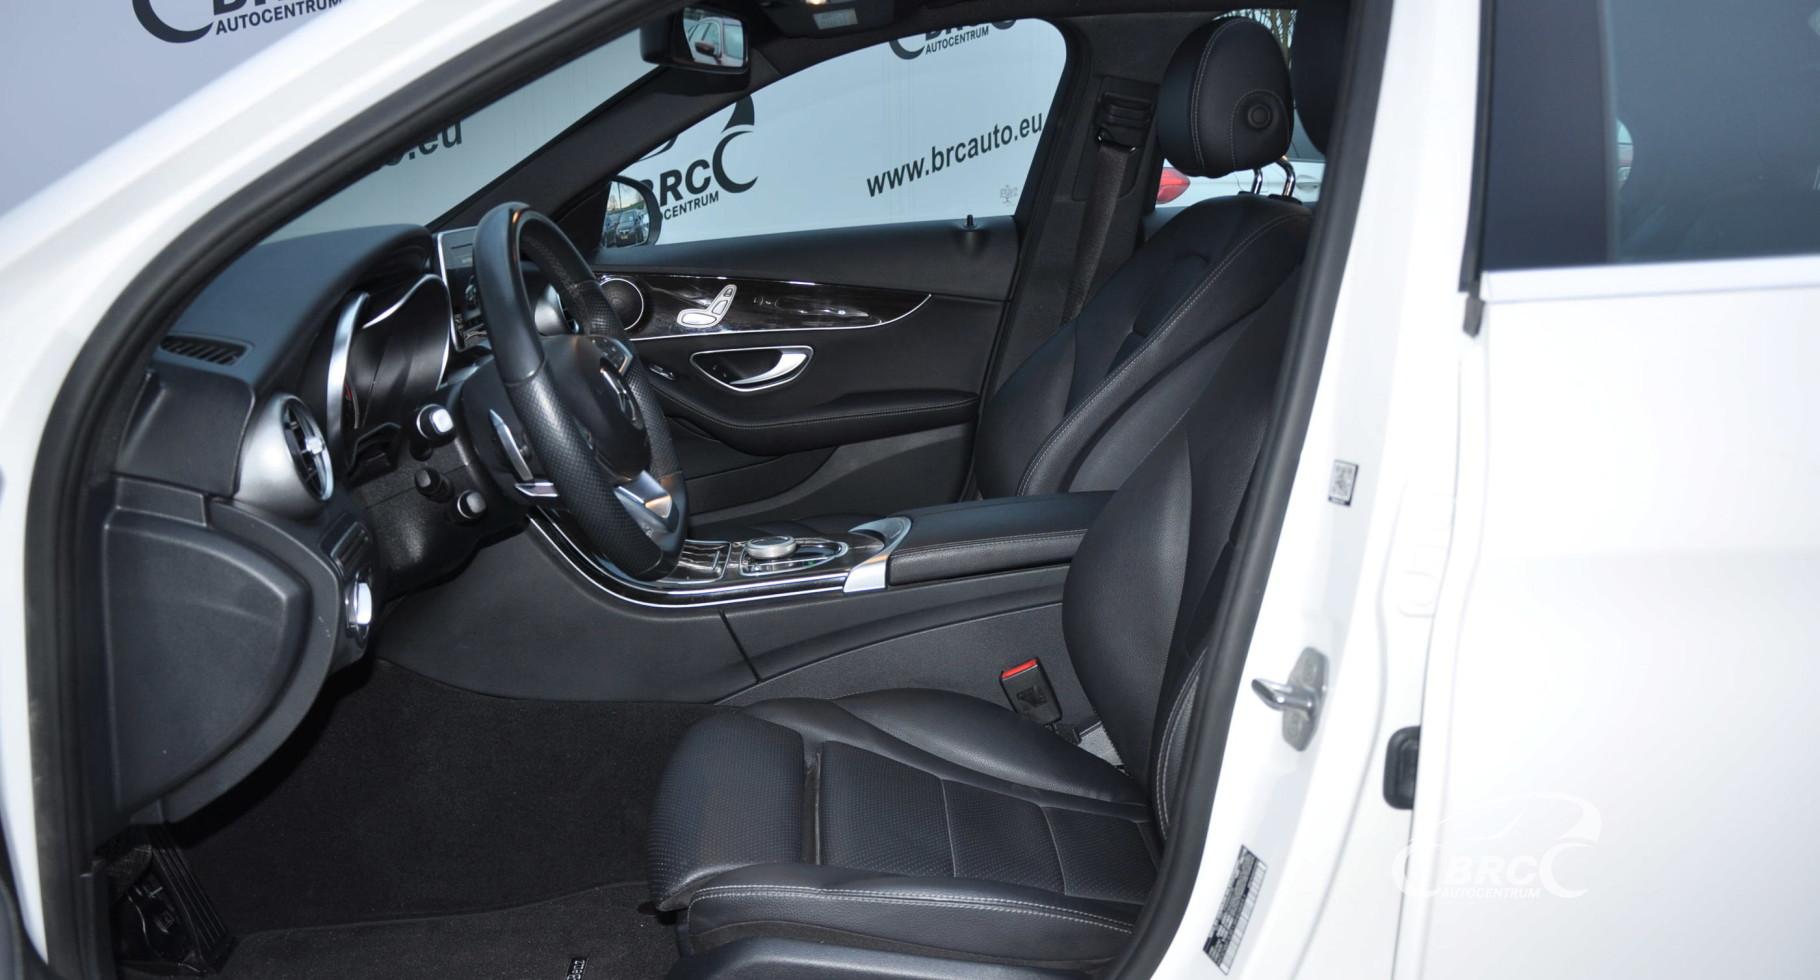 Mercedes-Benz C 300 Automatas